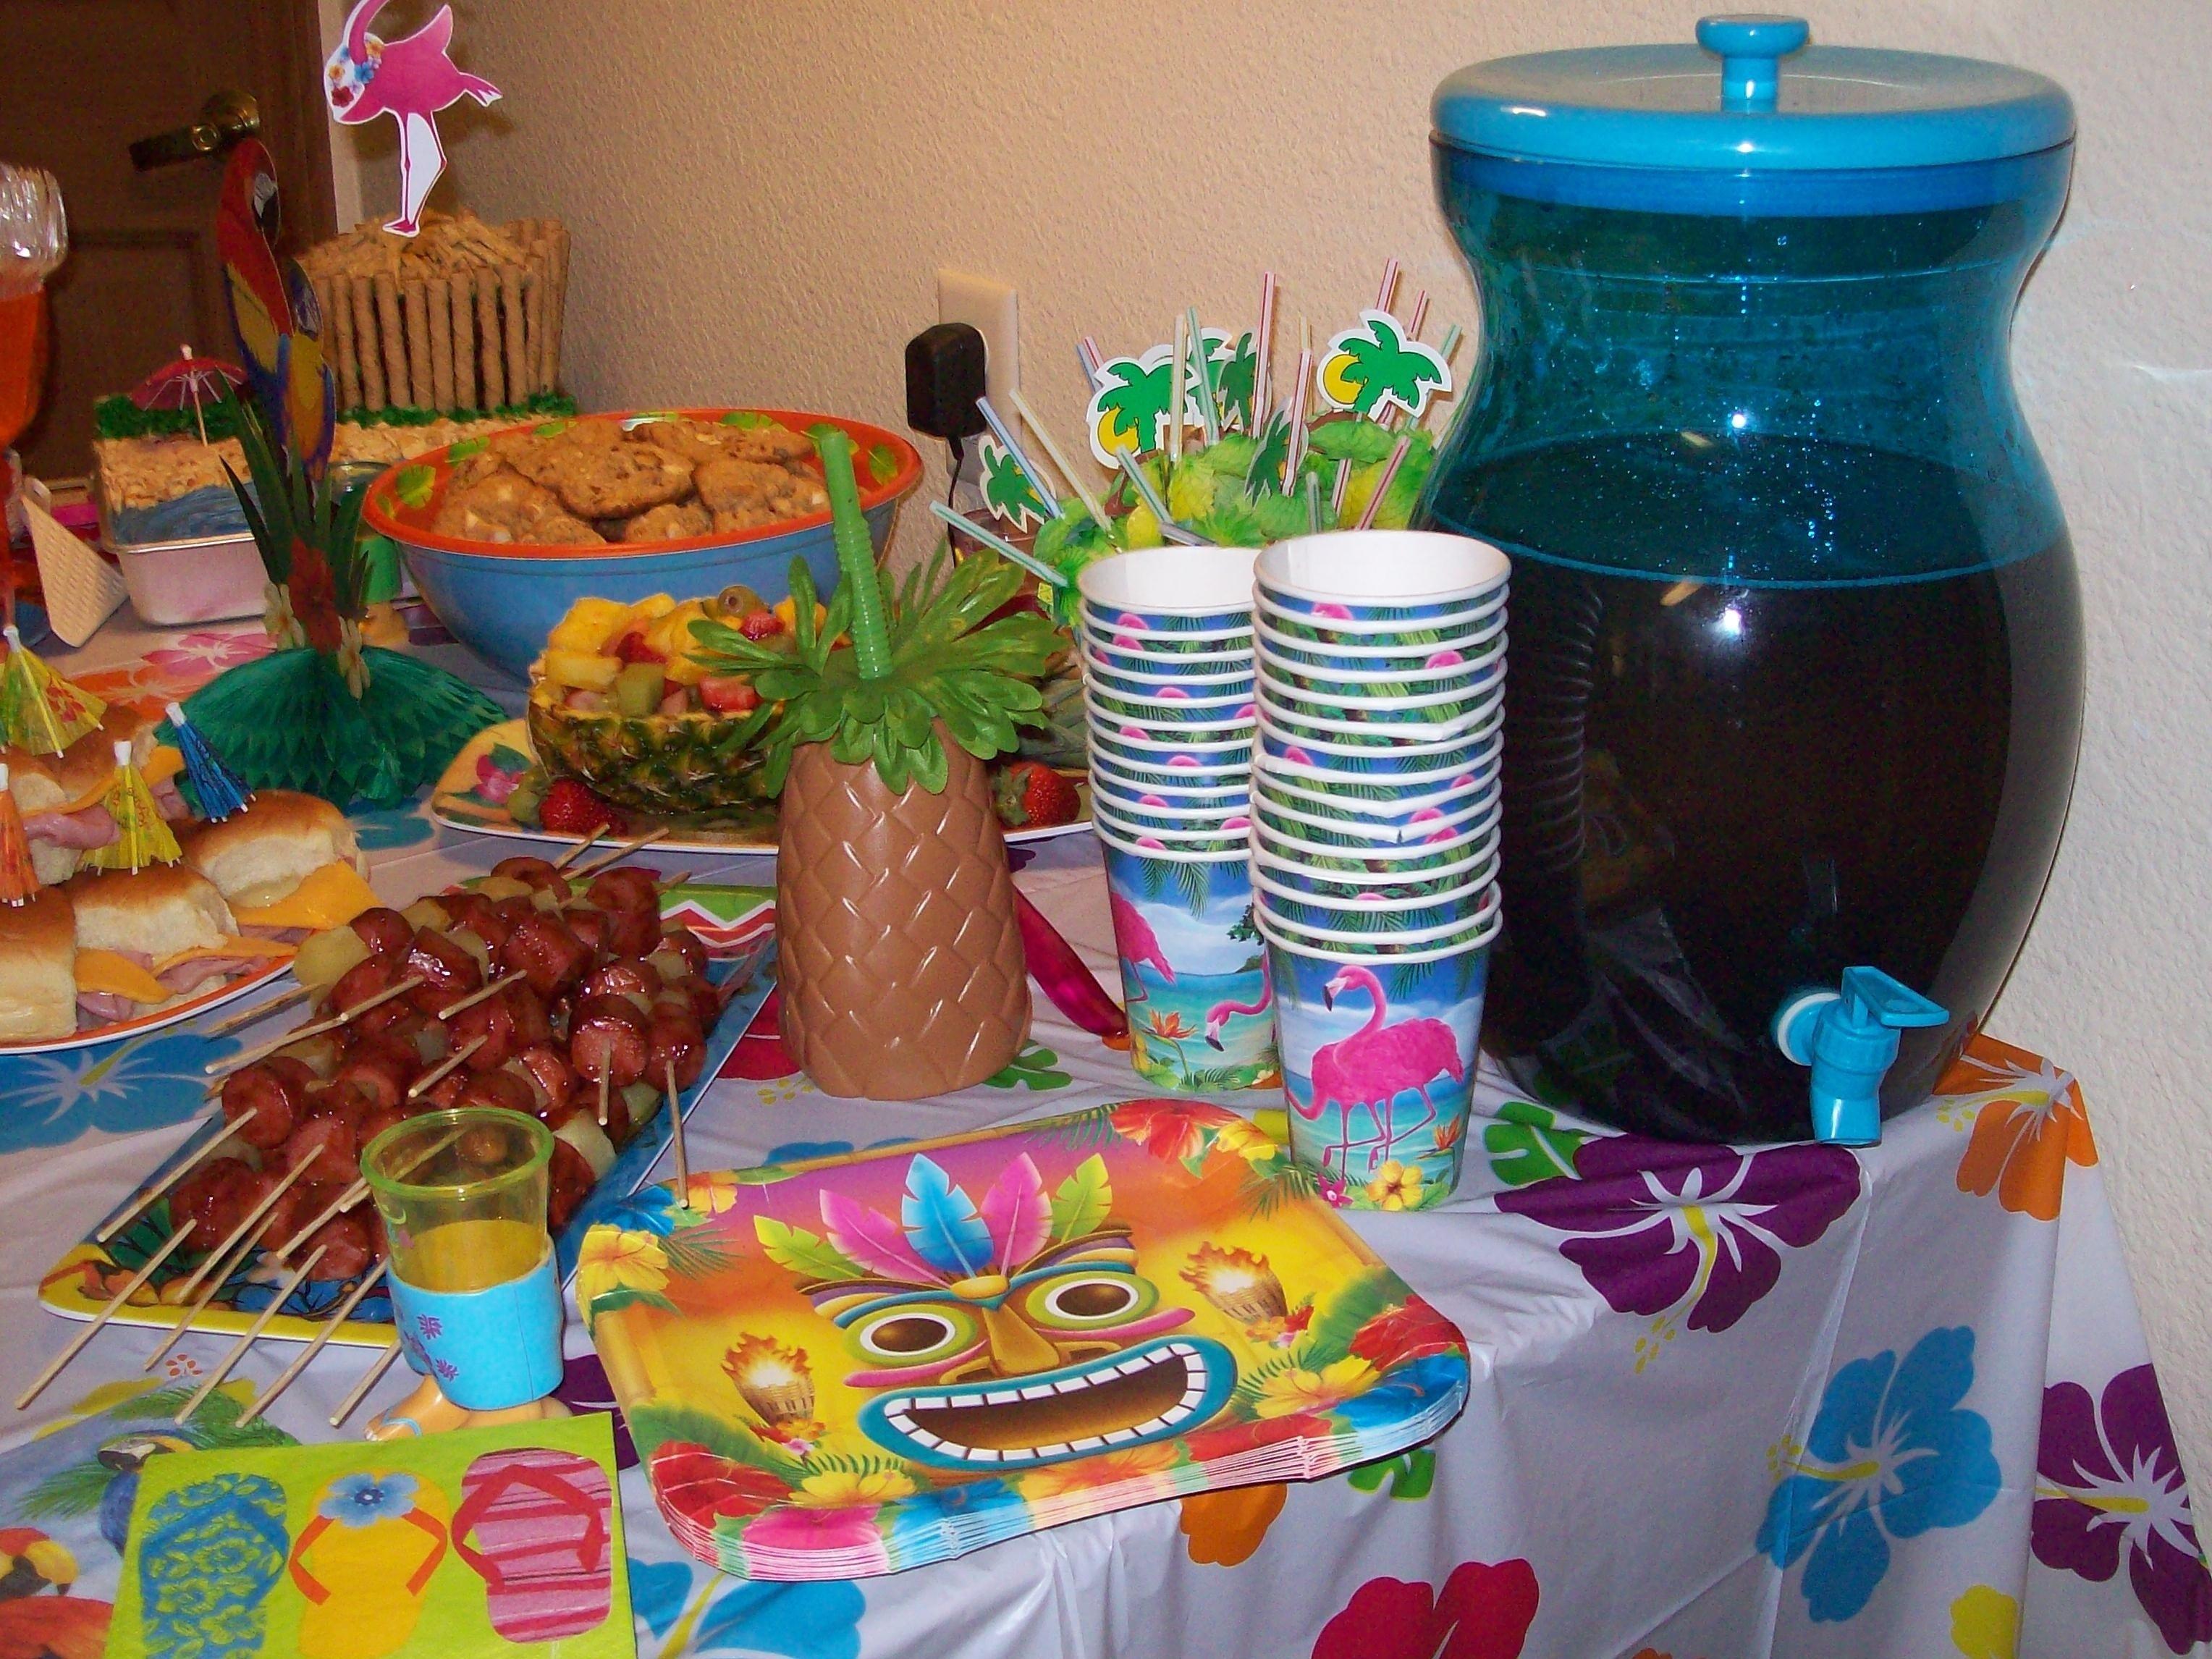 10 Fantastic Luau Party Ideas For Kids hawaiian birthday party ideas for kids luau party ideas for kid 2021